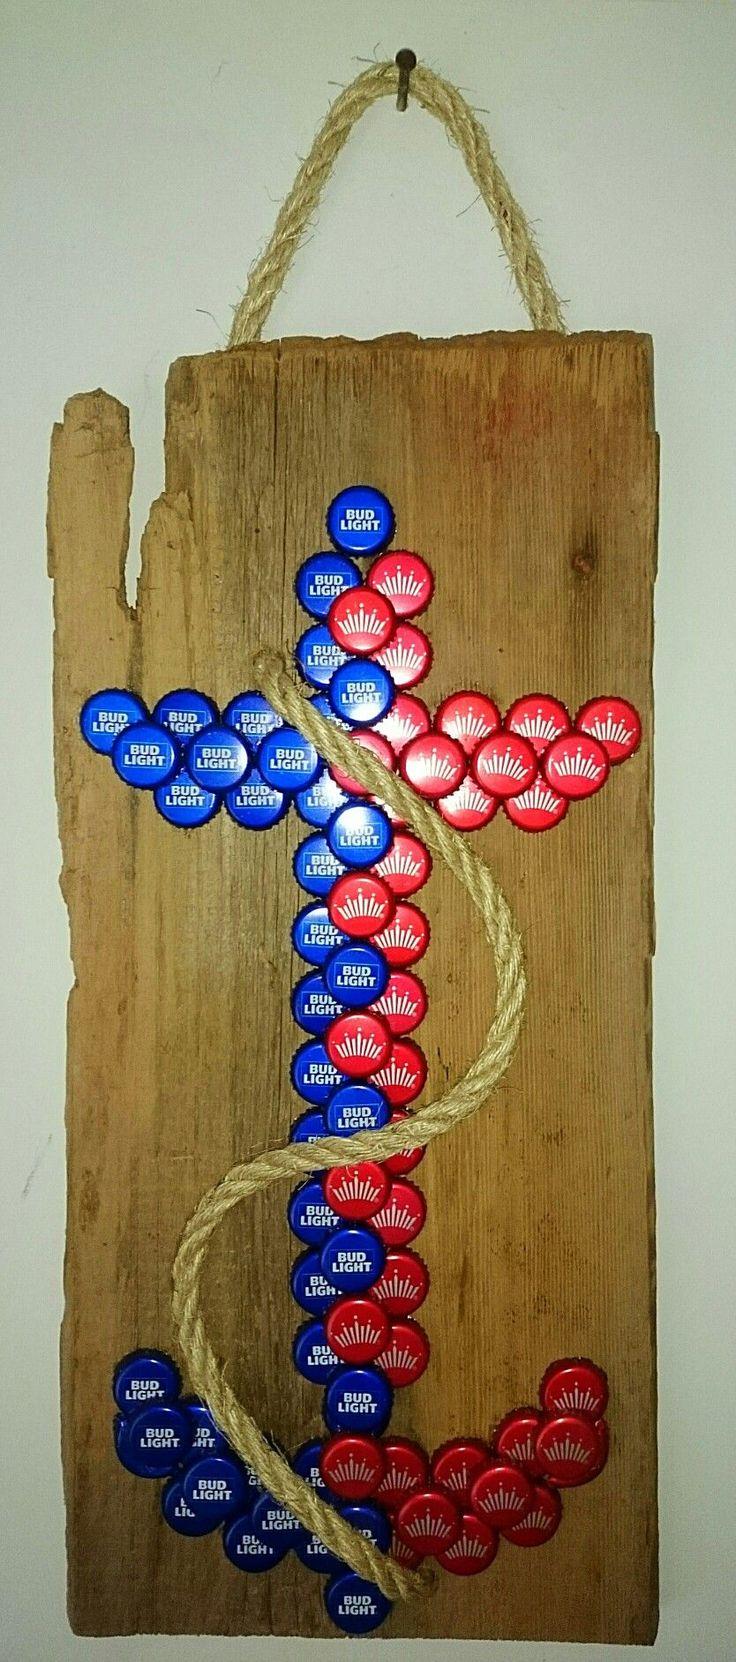 Best 25 bottle cap art ideas on pinterest bottle caps for Beer can craft ideas